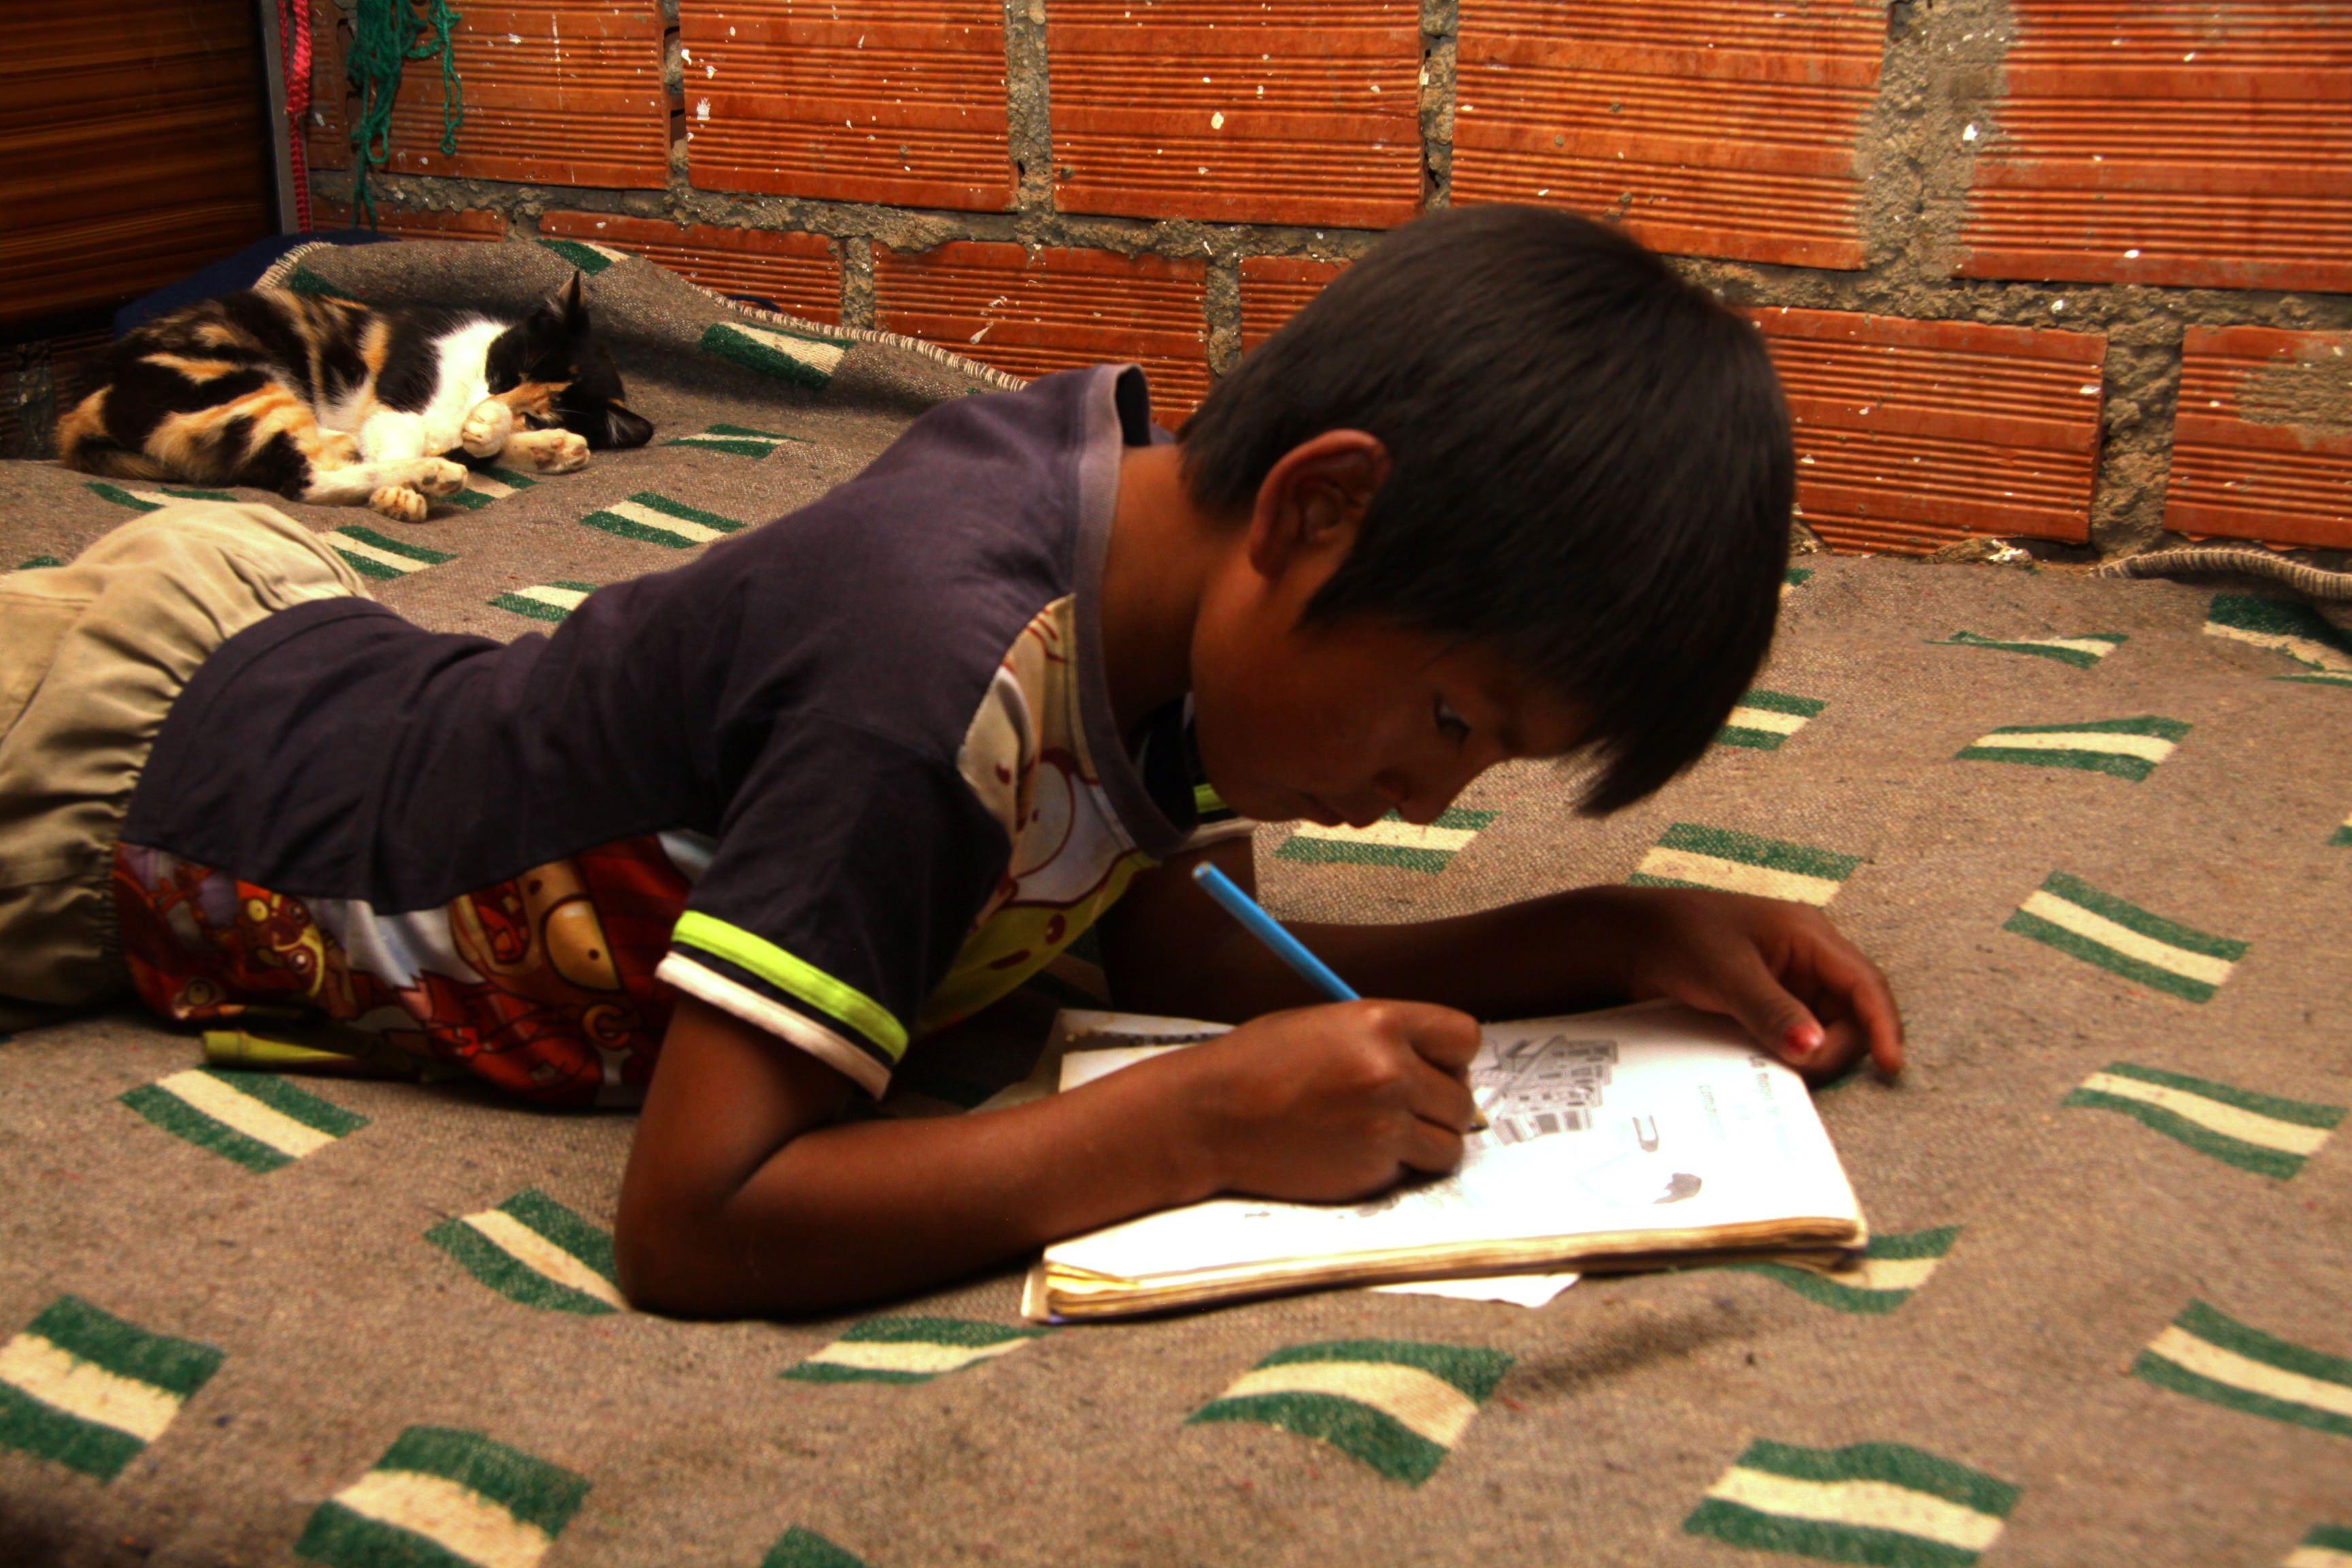 Jose doing his homework